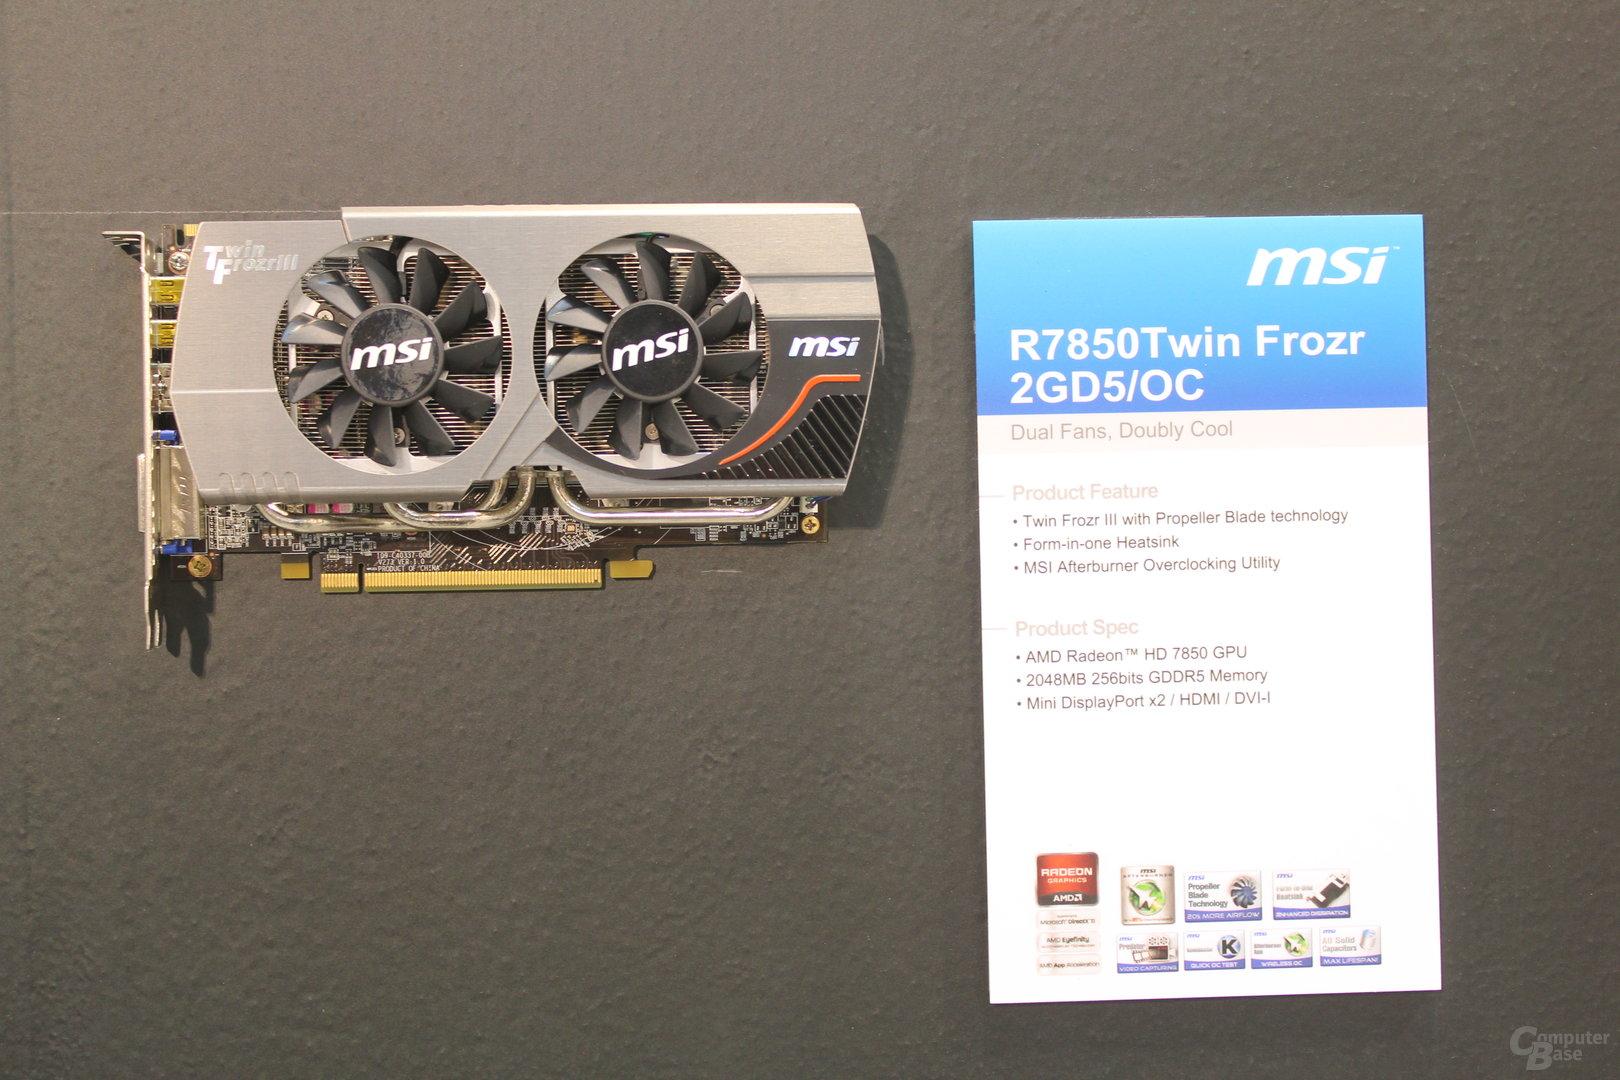 MSI R7850 Twin Frozr2 GD5/OC